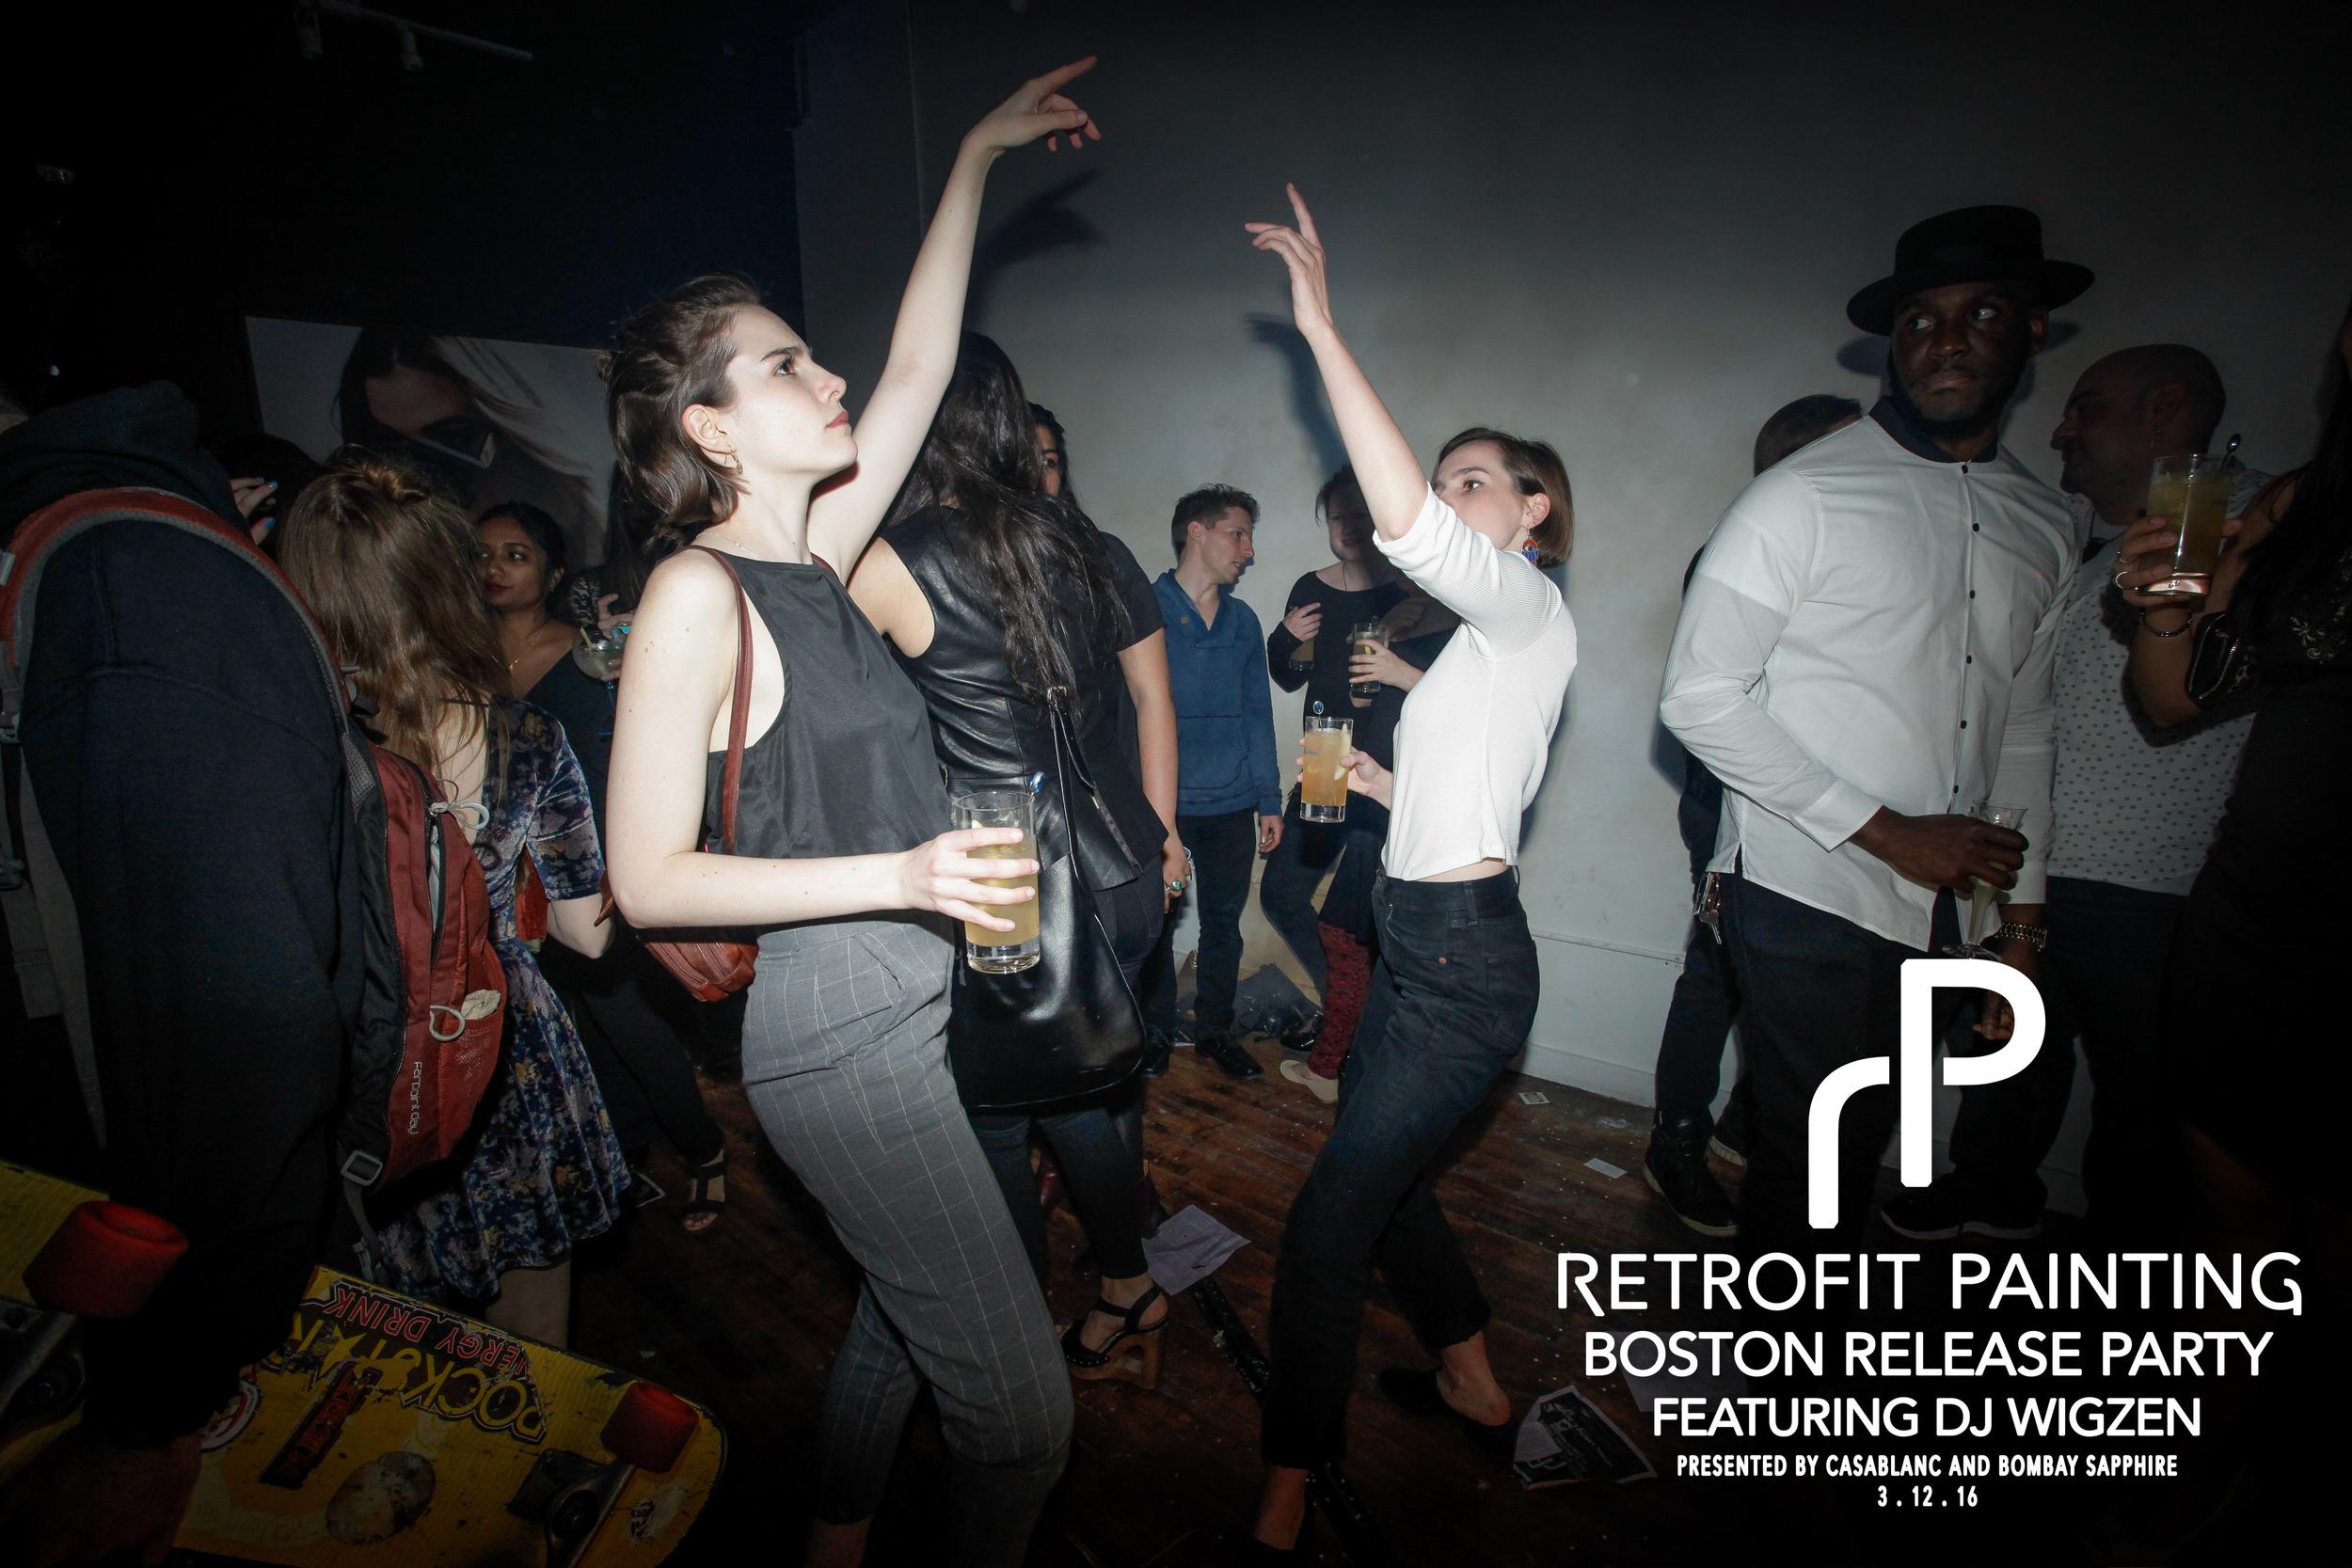 Retrofit Painting Boston Release Party 0141.jpg